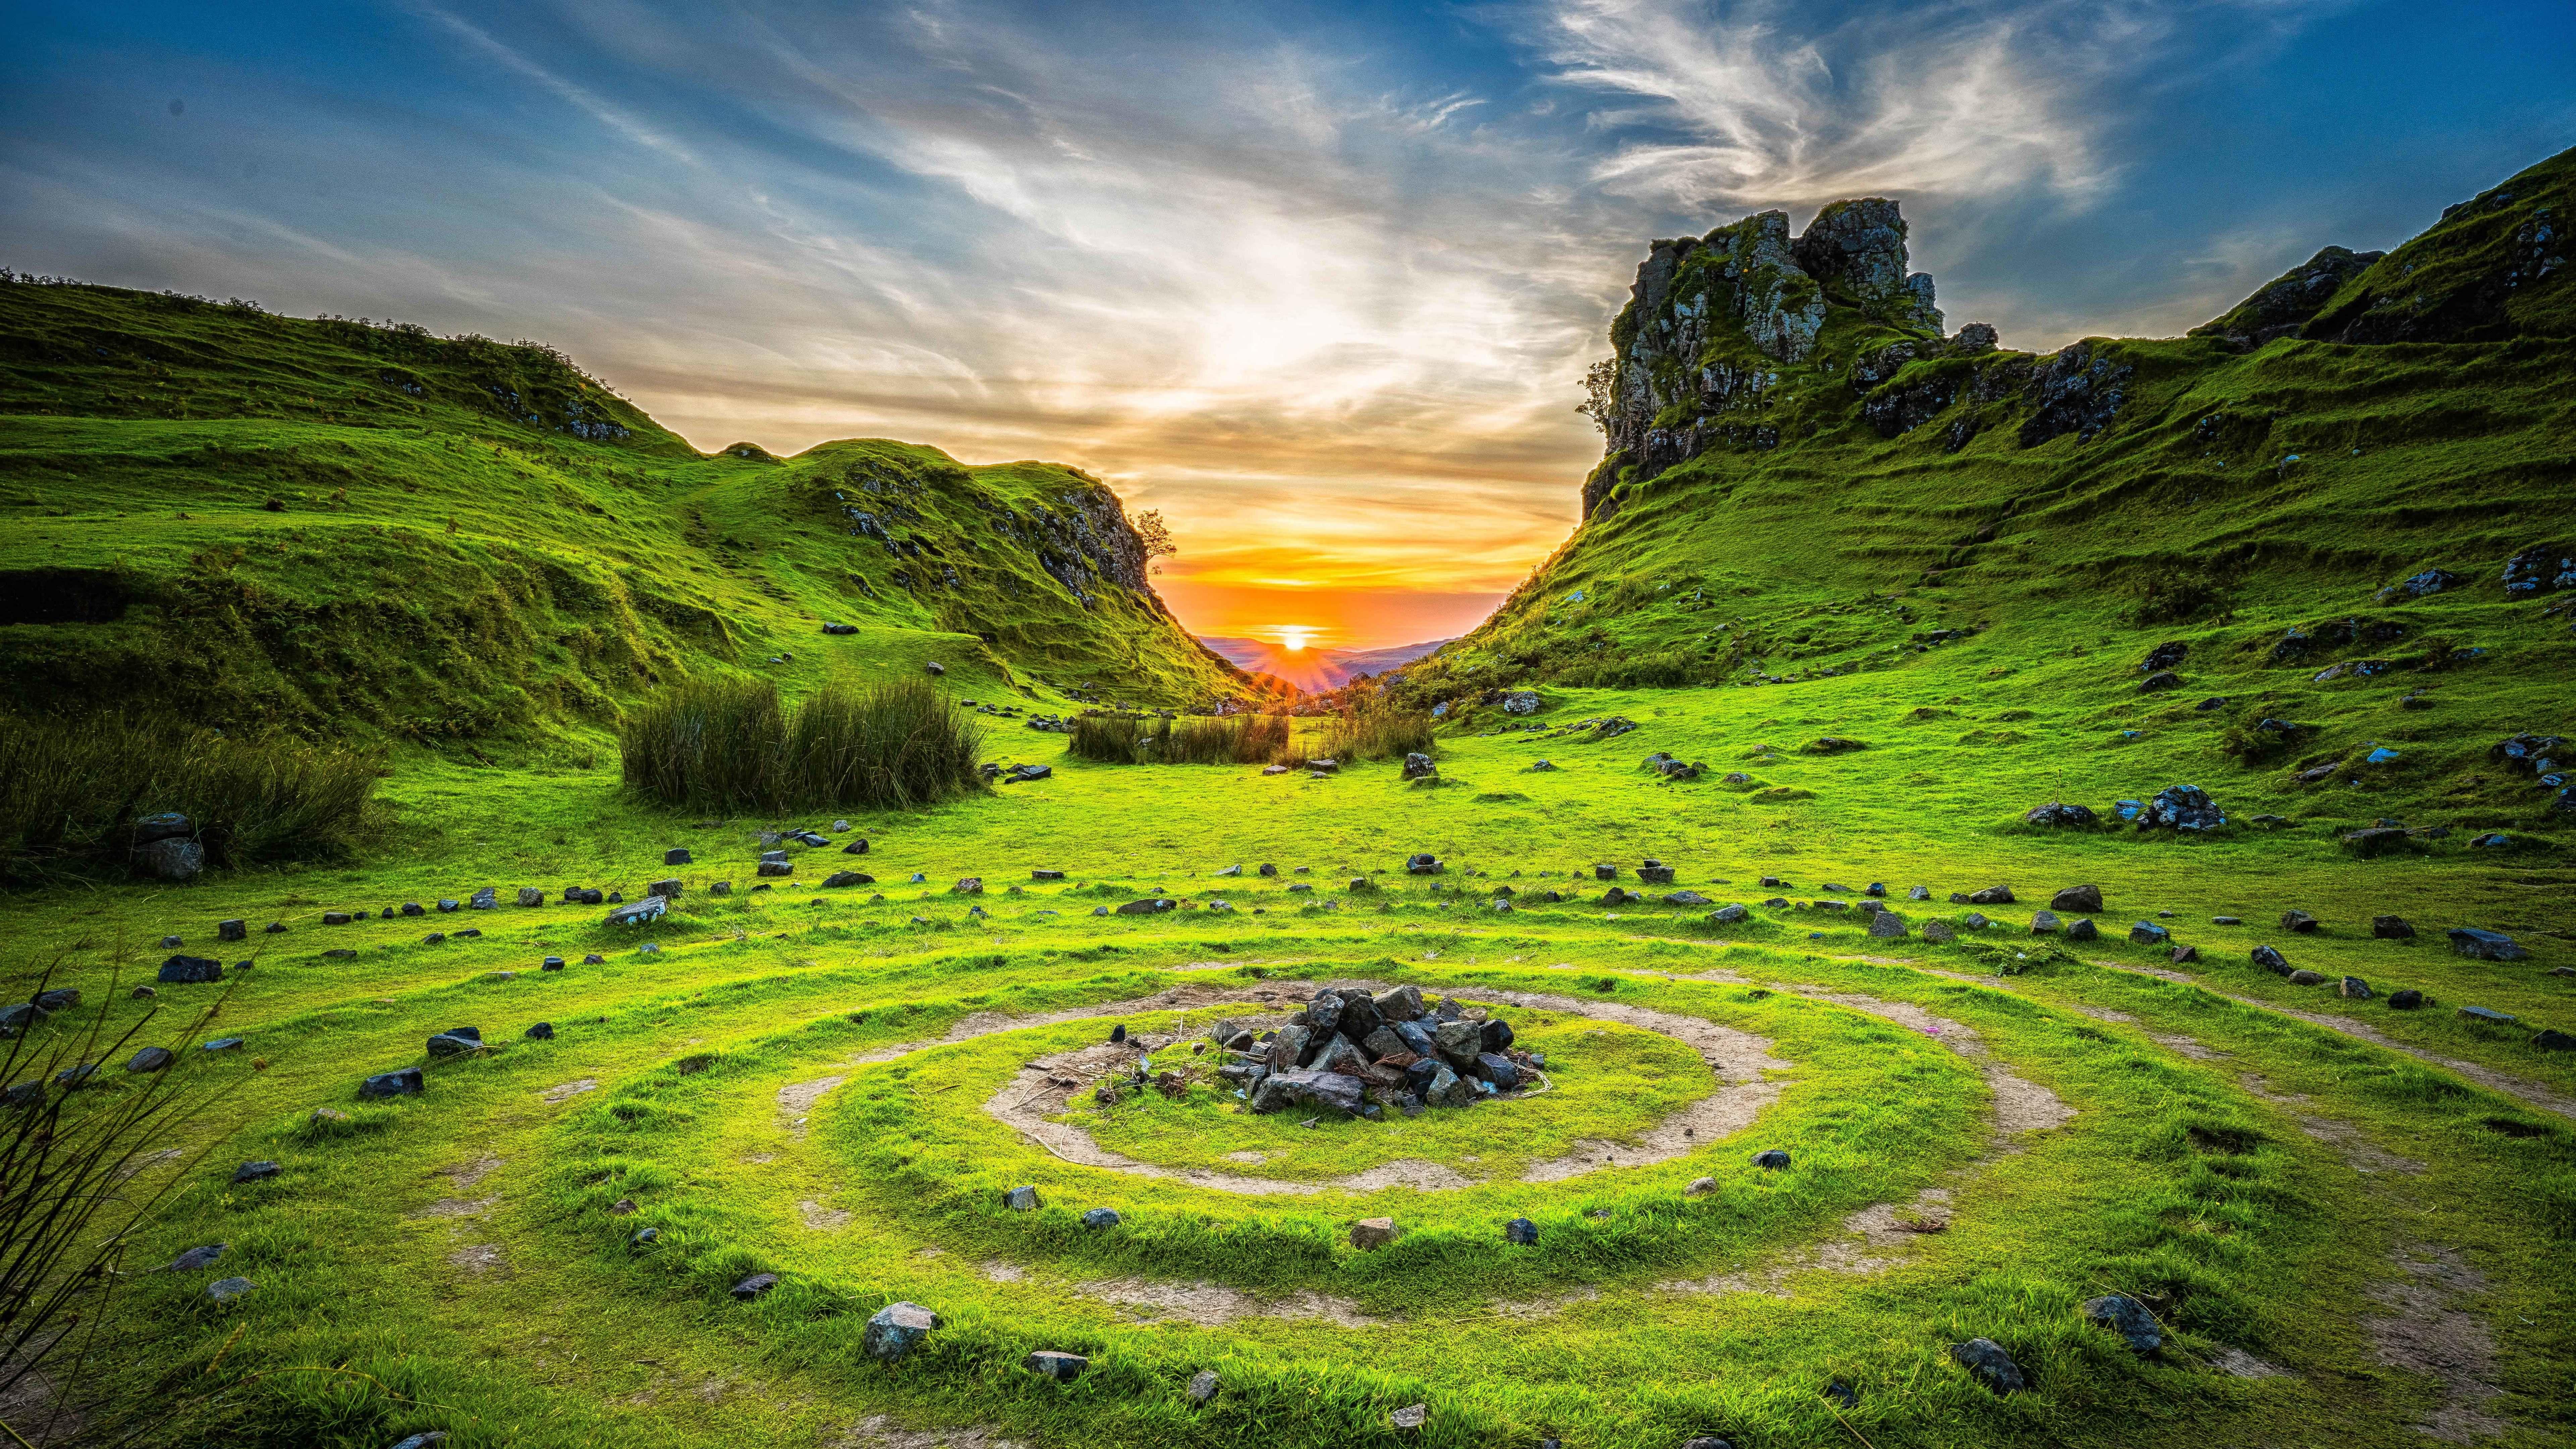 Fairy glen on Isle of Skye, Scotland wallpaper